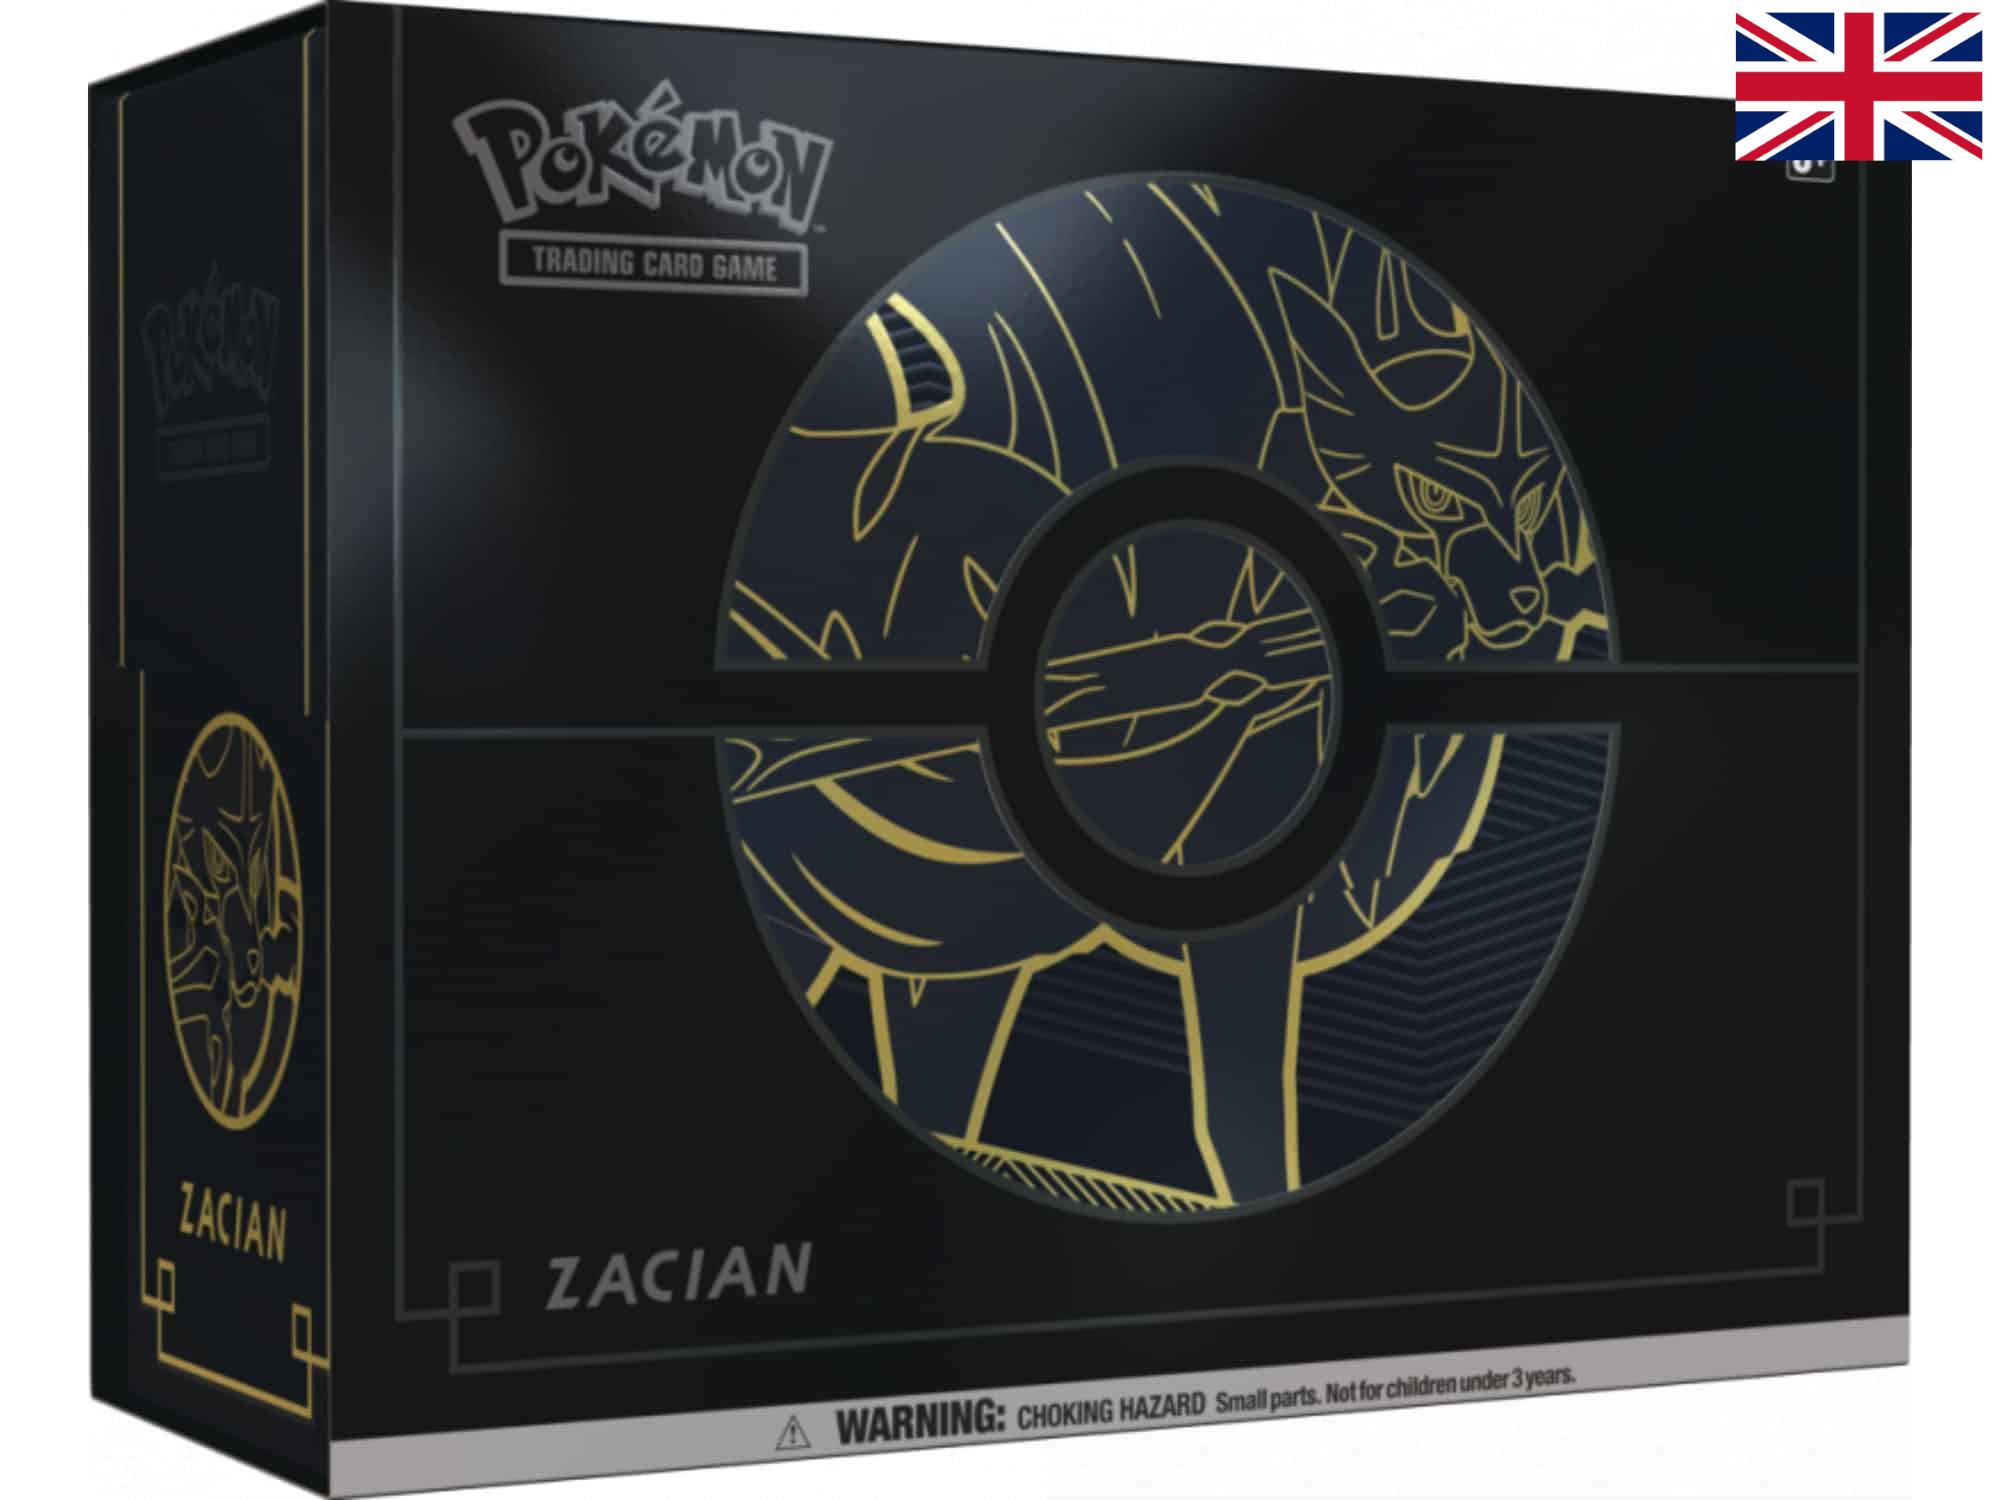 Pokémon - Elite Trainer Box Plus (Zacian)